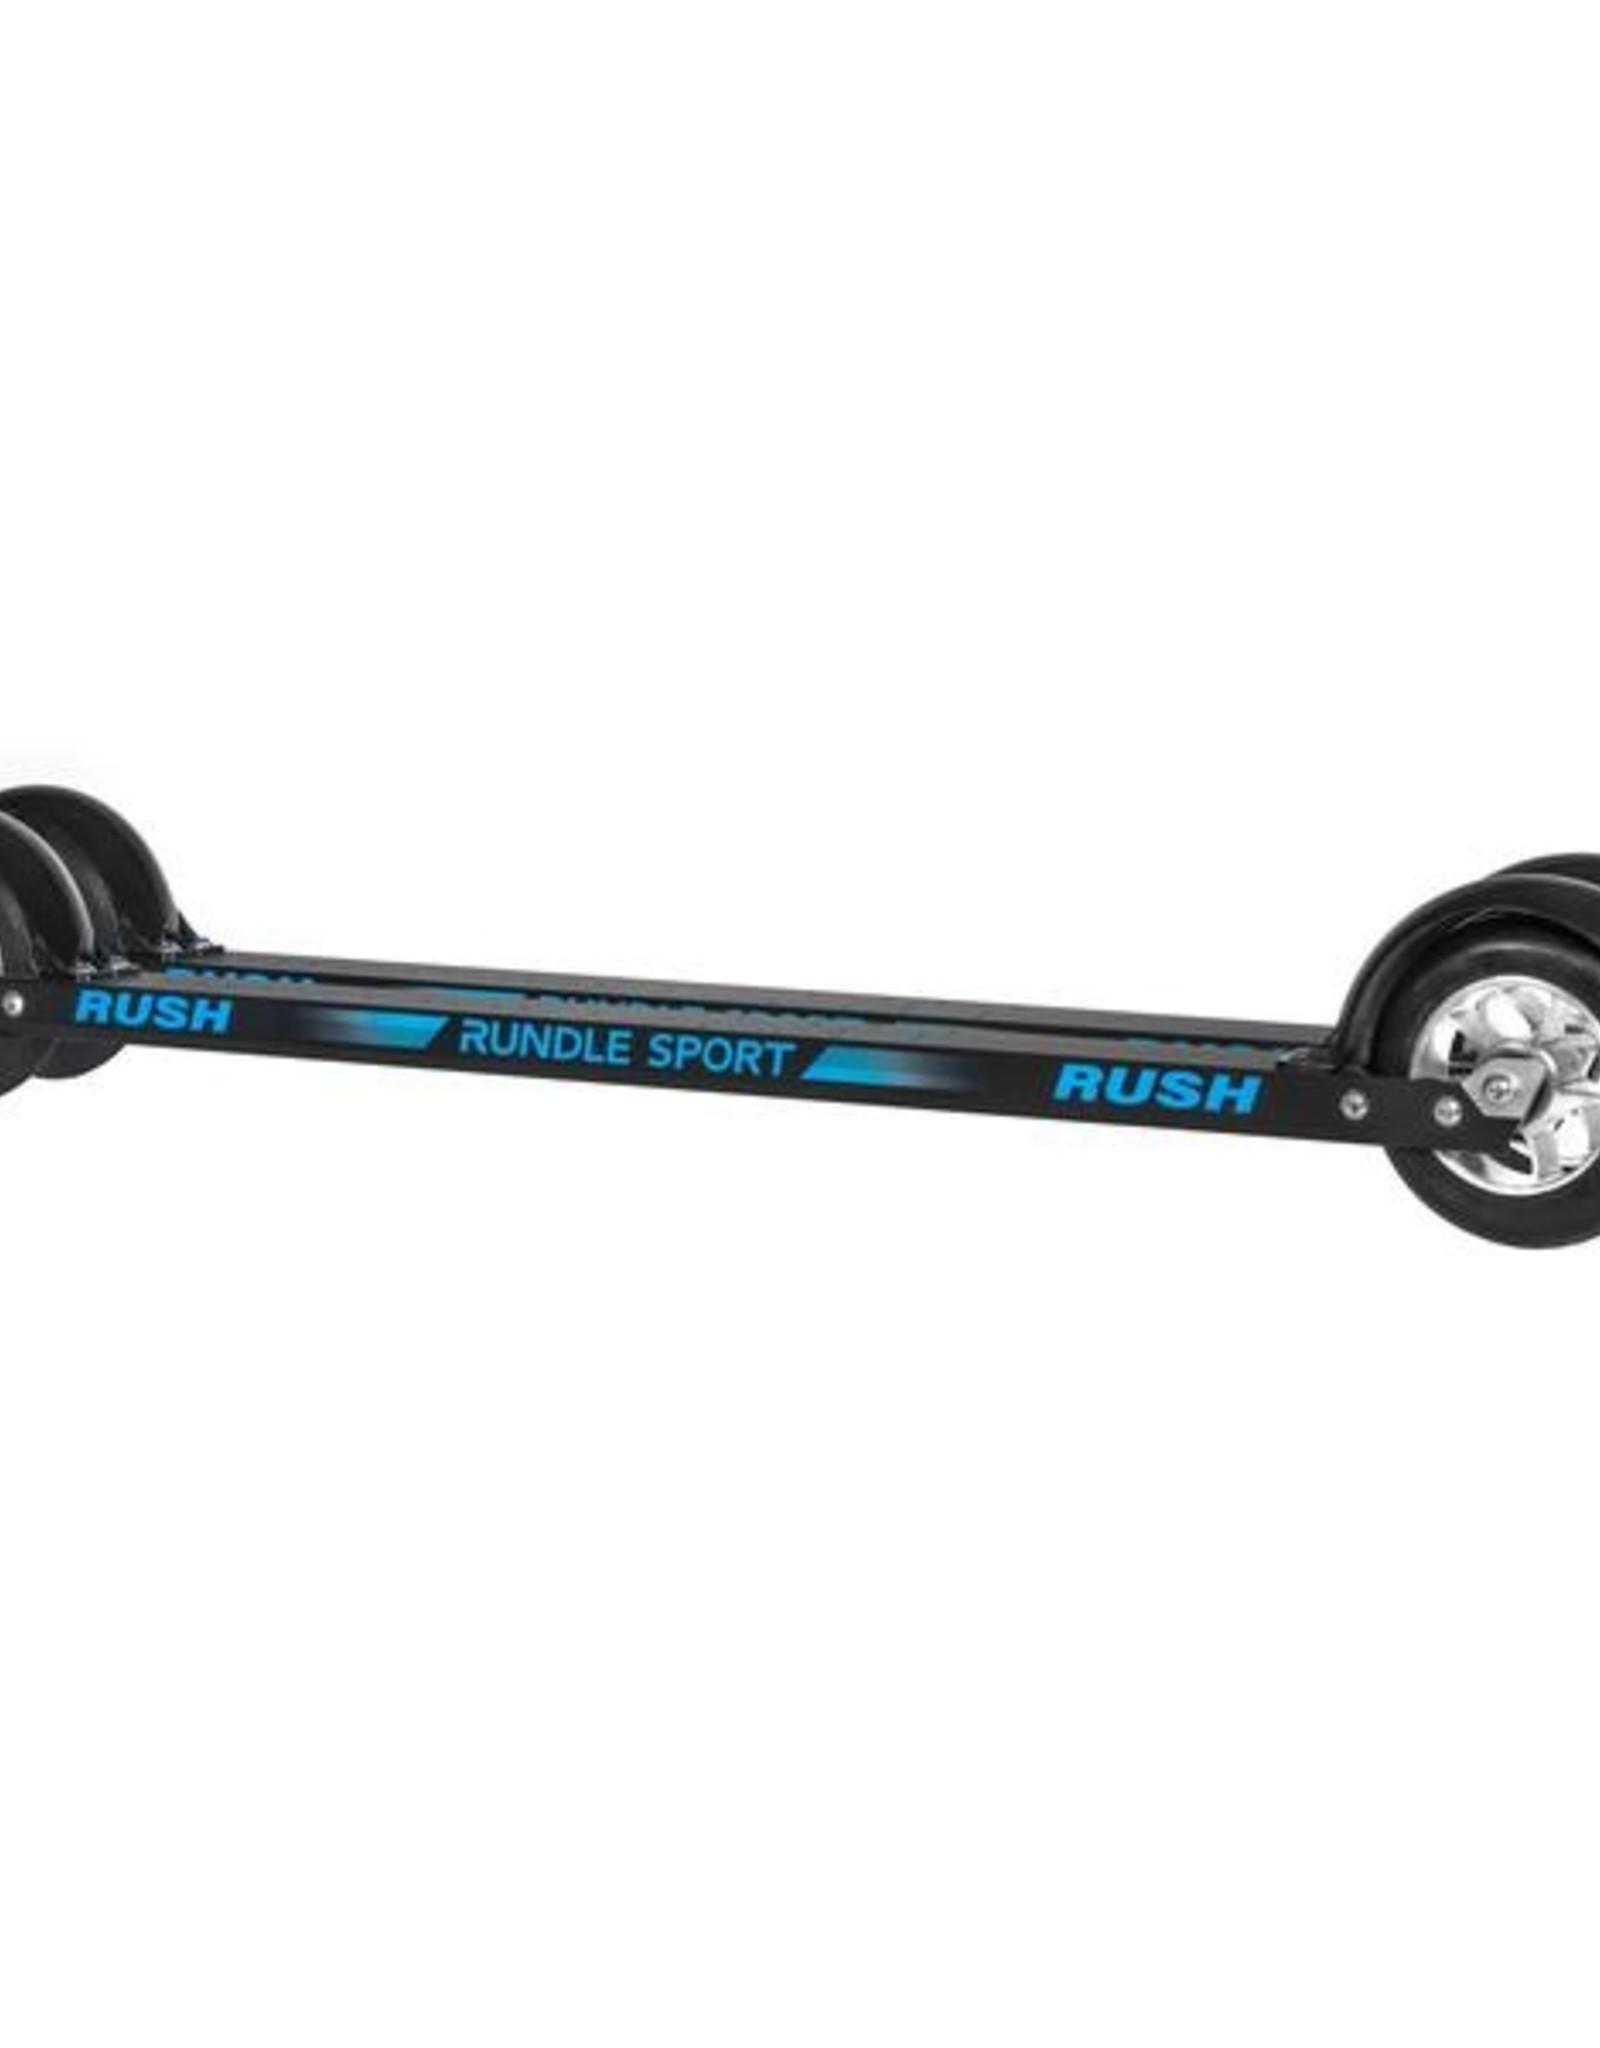 Rundle Sport inc. Rush Skate